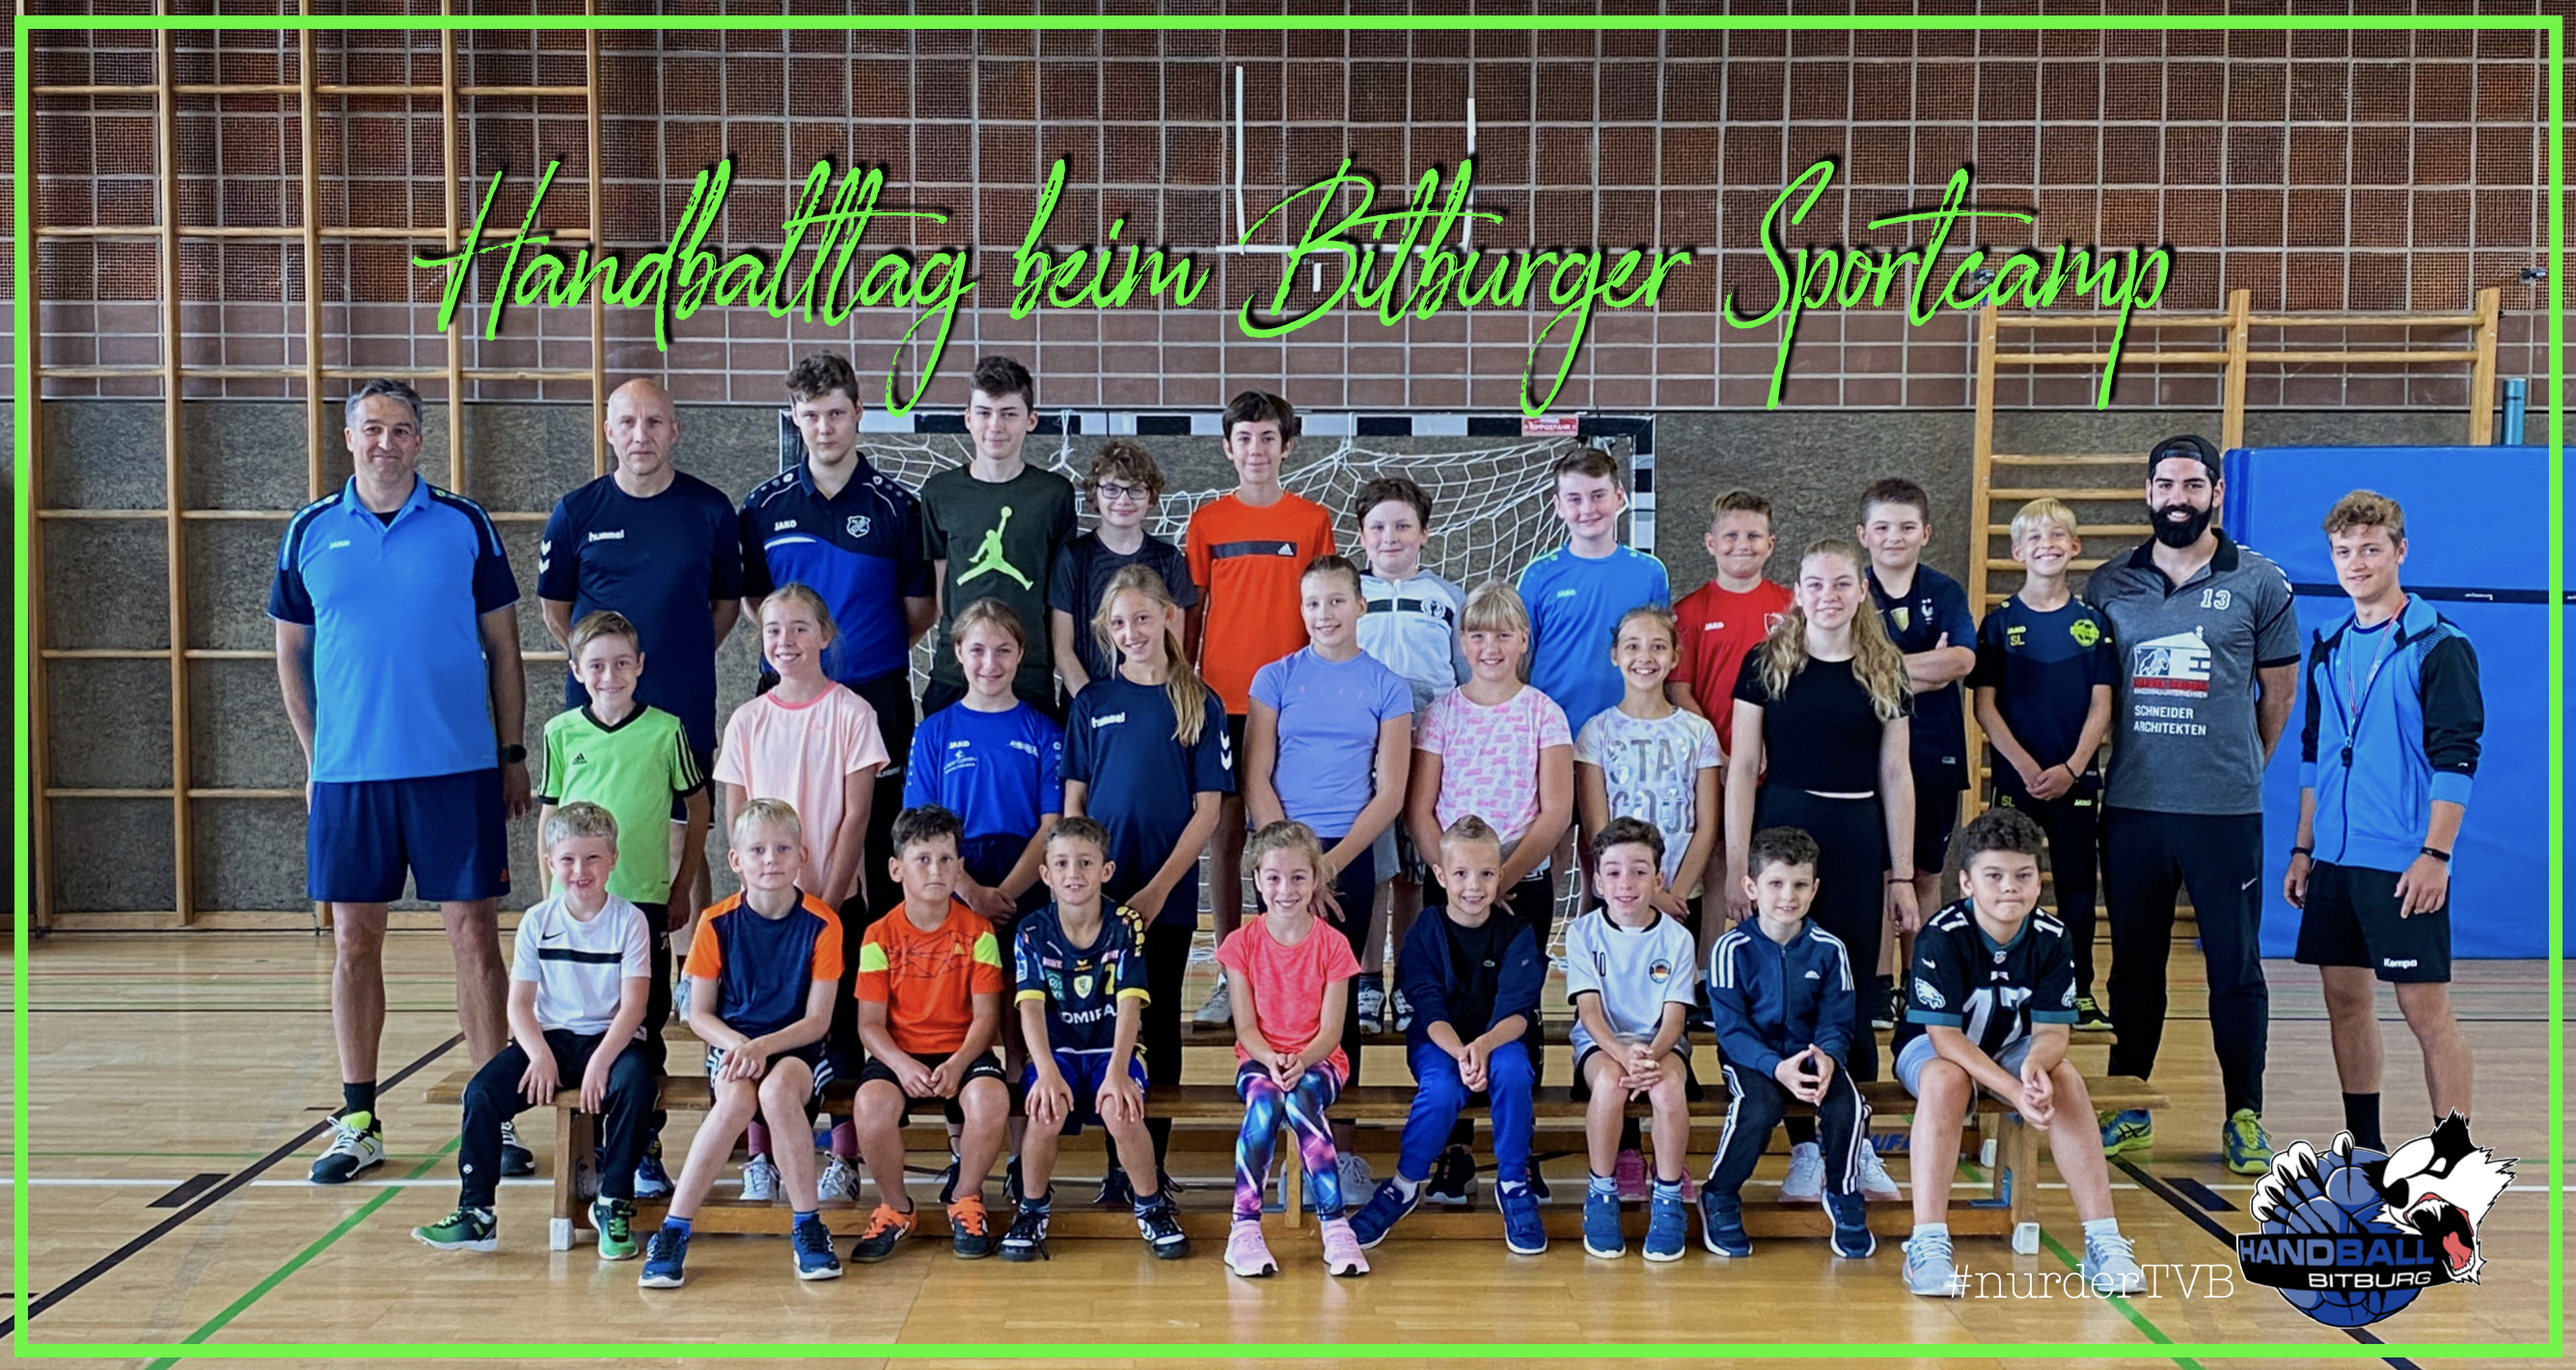 Handballtag beim Bitburger Sportcamp